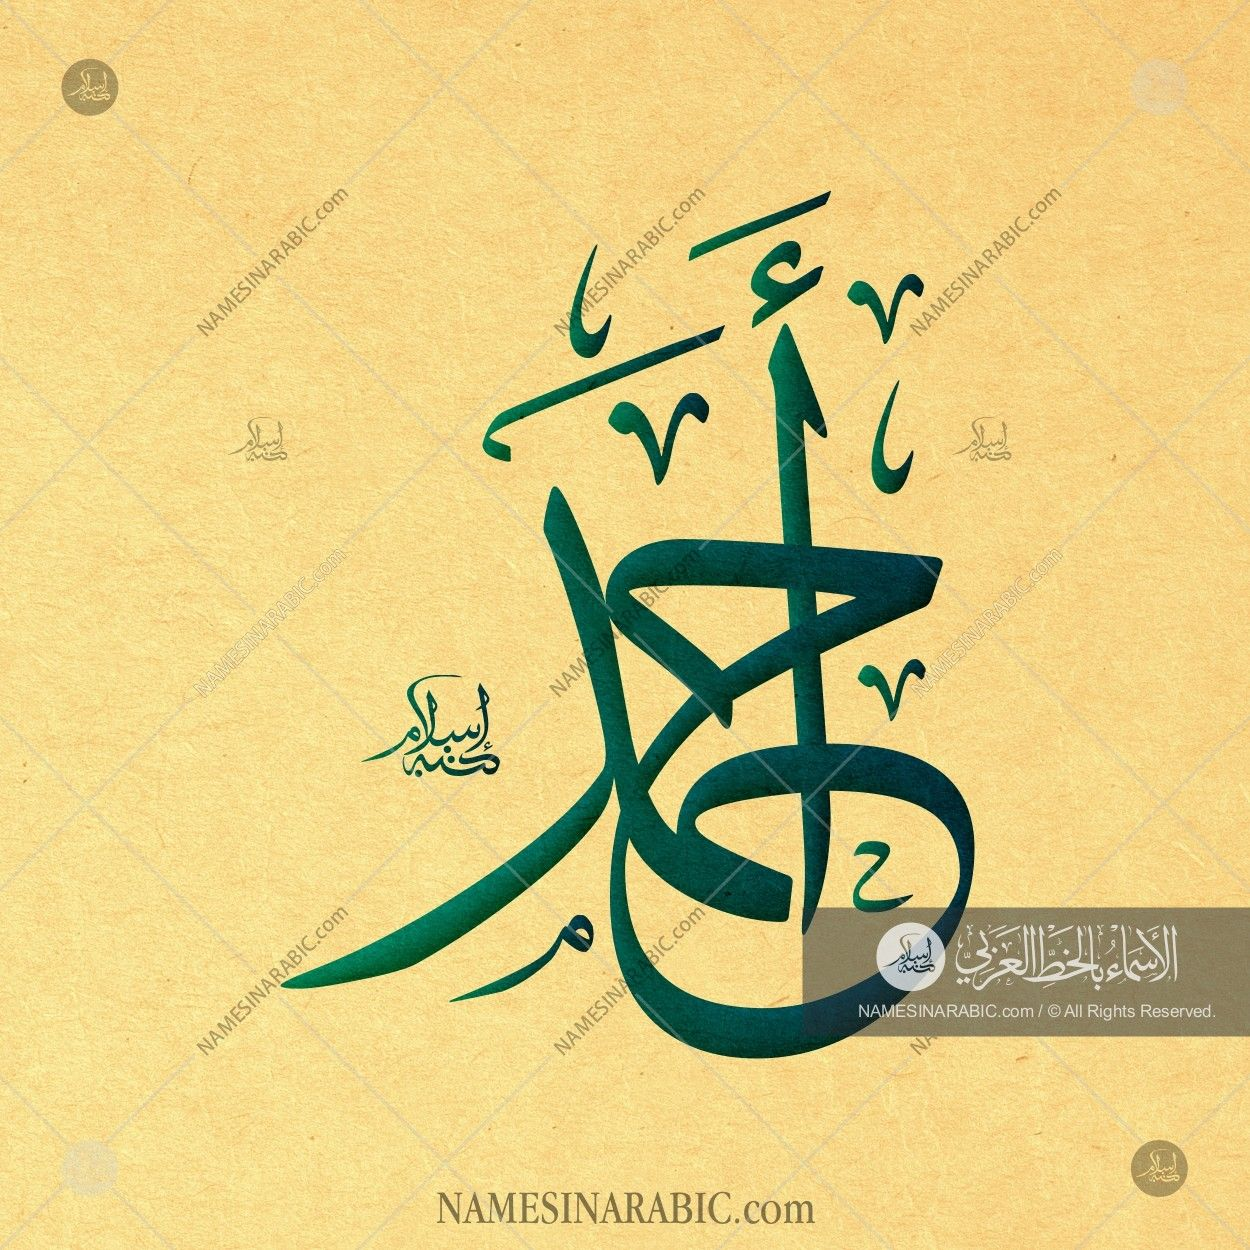 Ahmad Name In Arabic Calligraphy Calligraphy Name Arabic Calligraphy Art Islamic Calligraphy